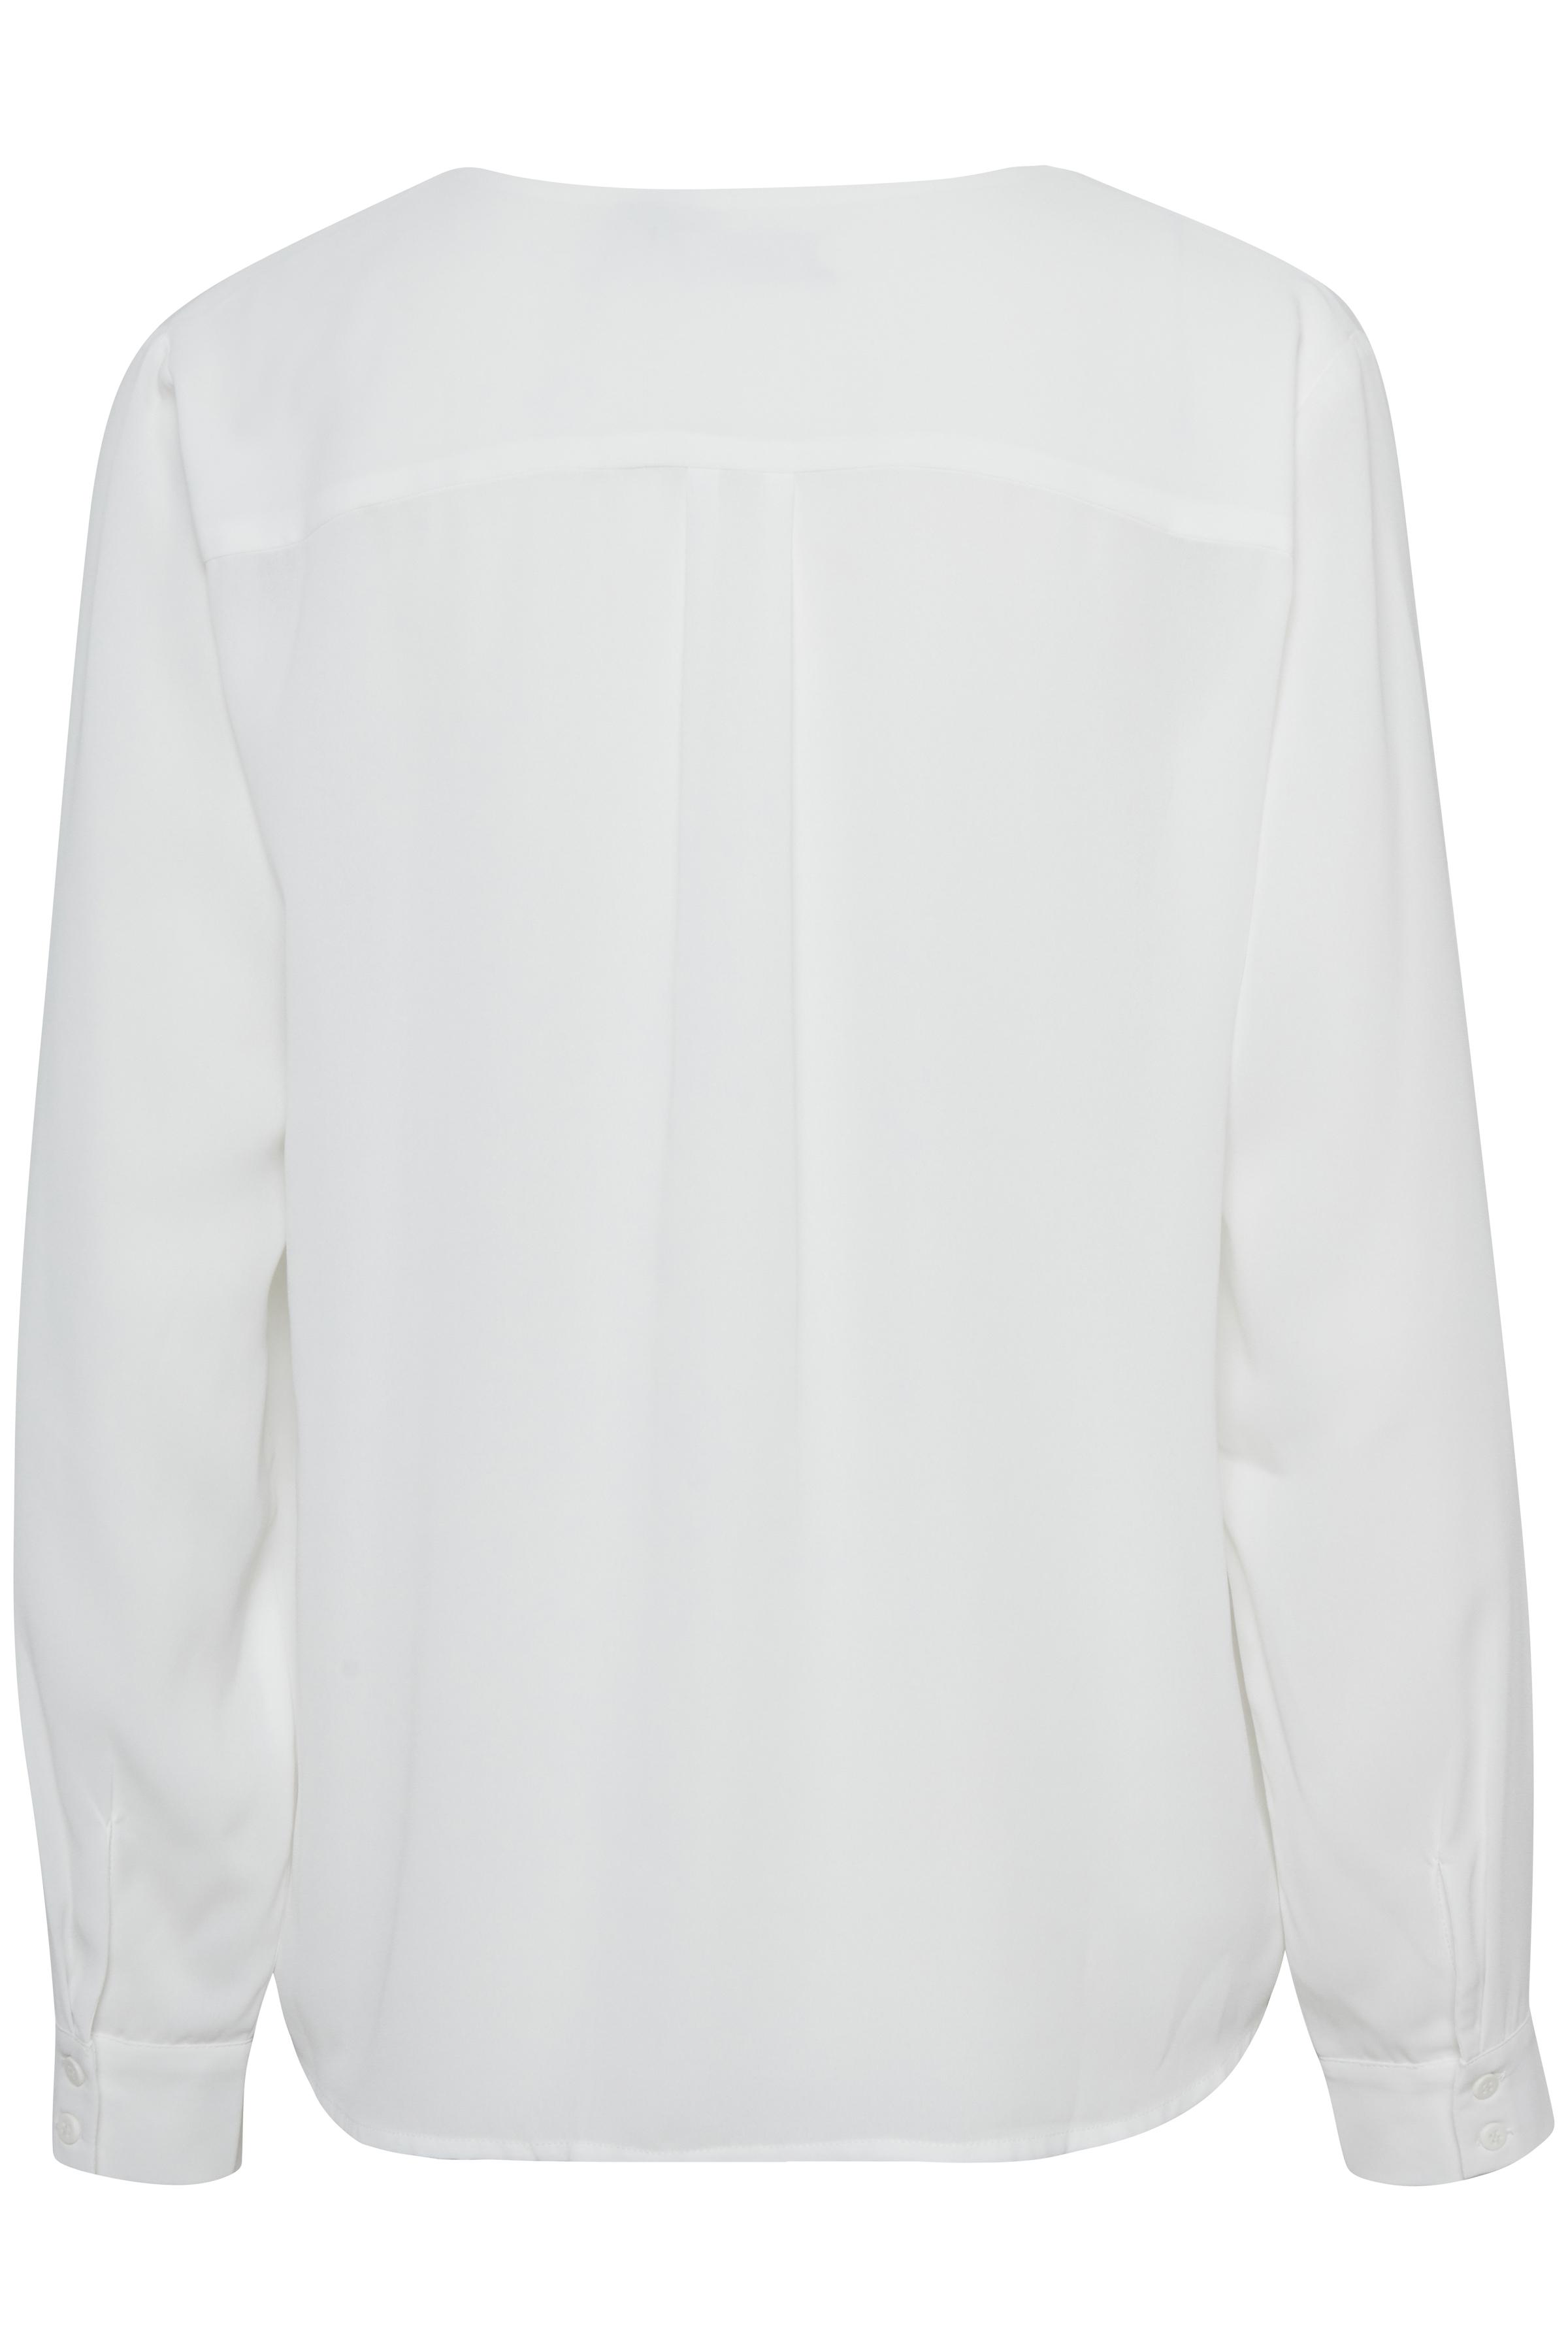 Wollweiß Langarm-Bluse von b.young – Shoppen Sie Wollweiß Langarm-Bluse ab Gr. 34-46 hier